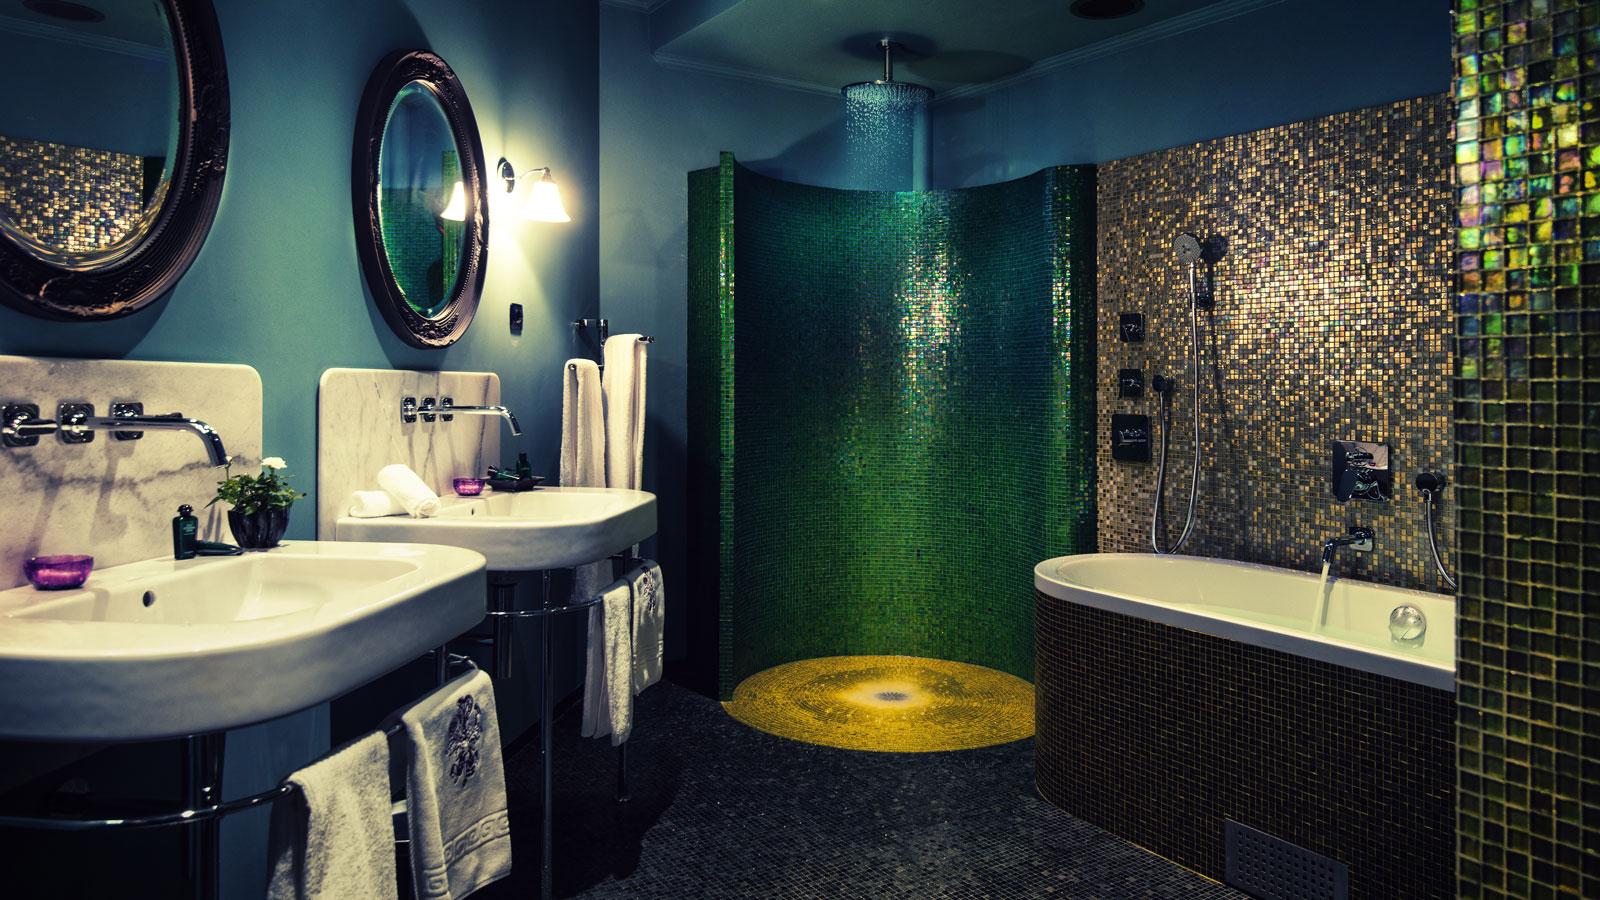 Magnifika hotell dorsia i g teborg badrumsdr mmar - Interior design styles bathroom ...